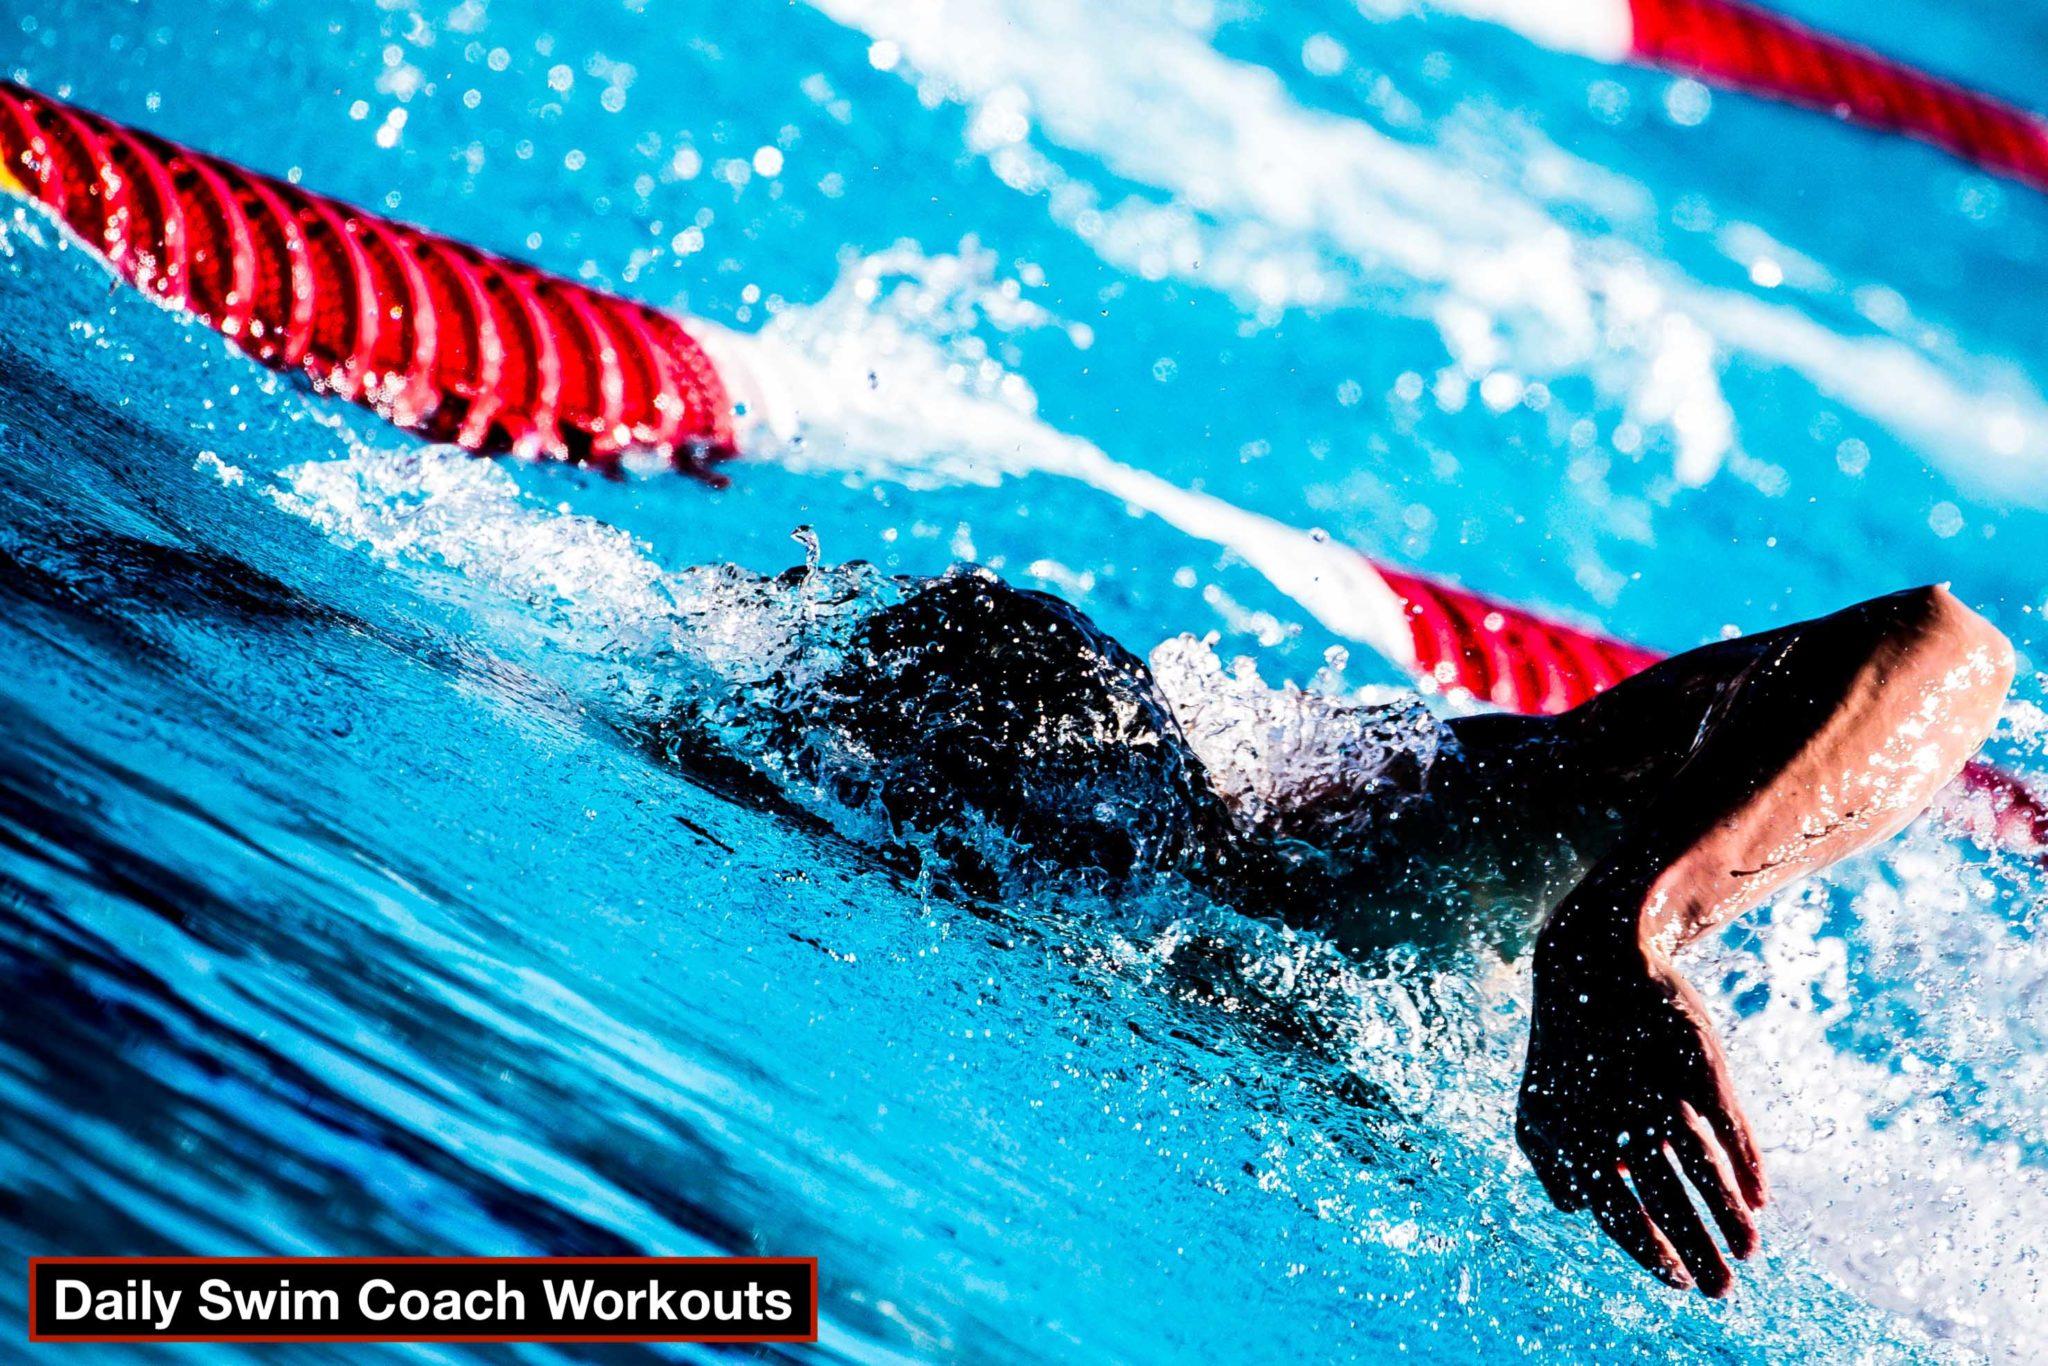 Daily Swim Coach Workout #198